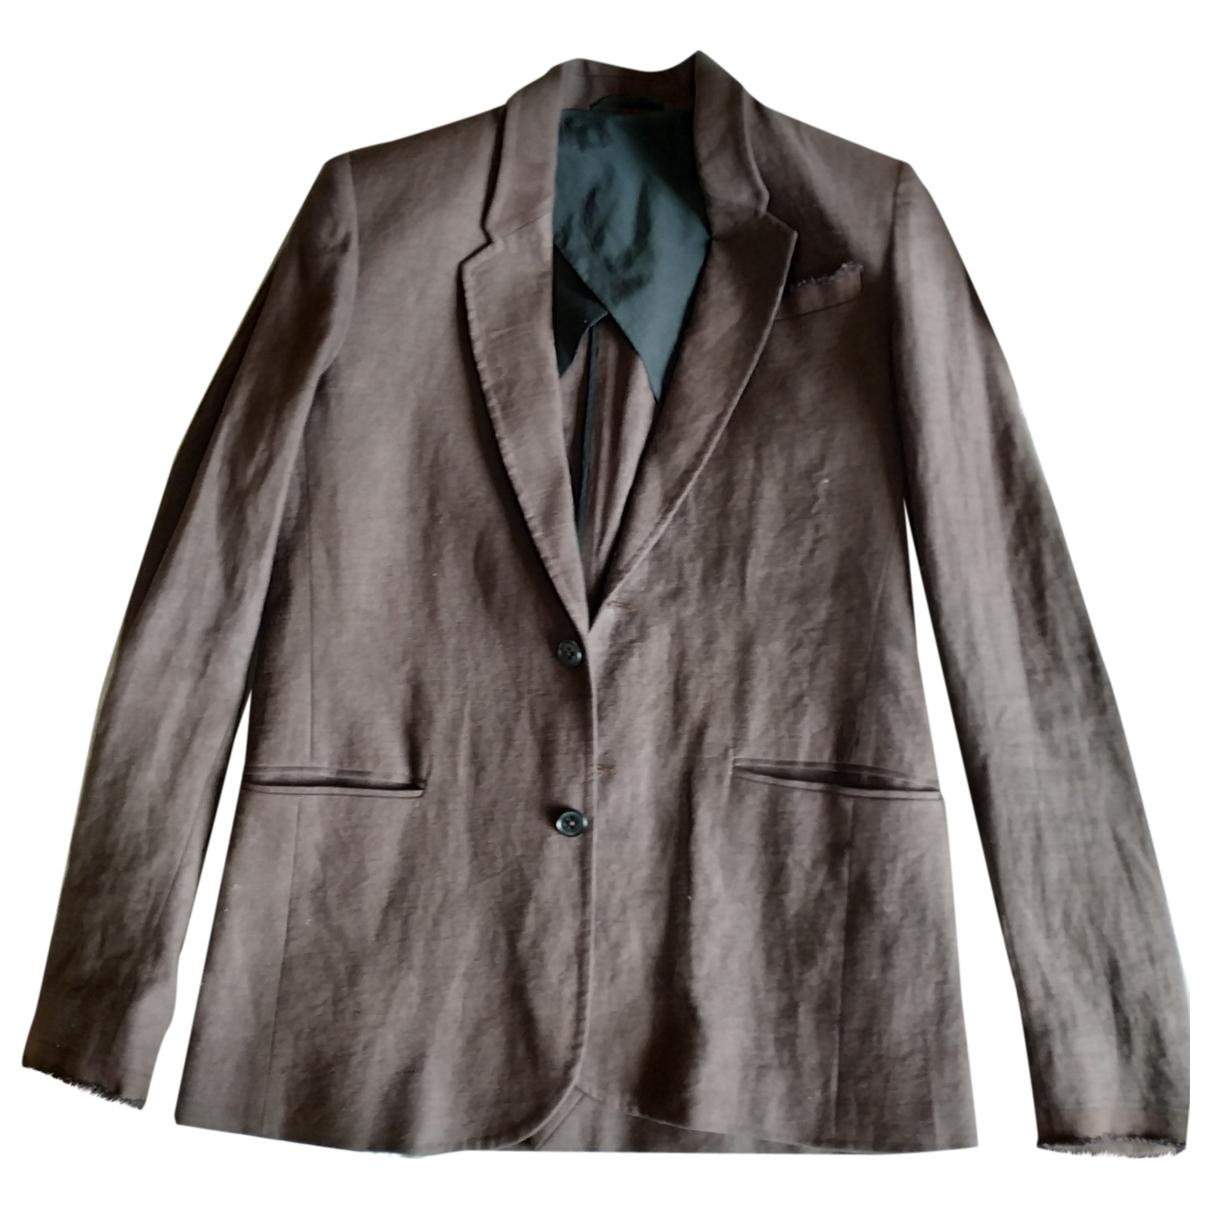 Damir Doma \N Brown Linen jacket  for Men S International